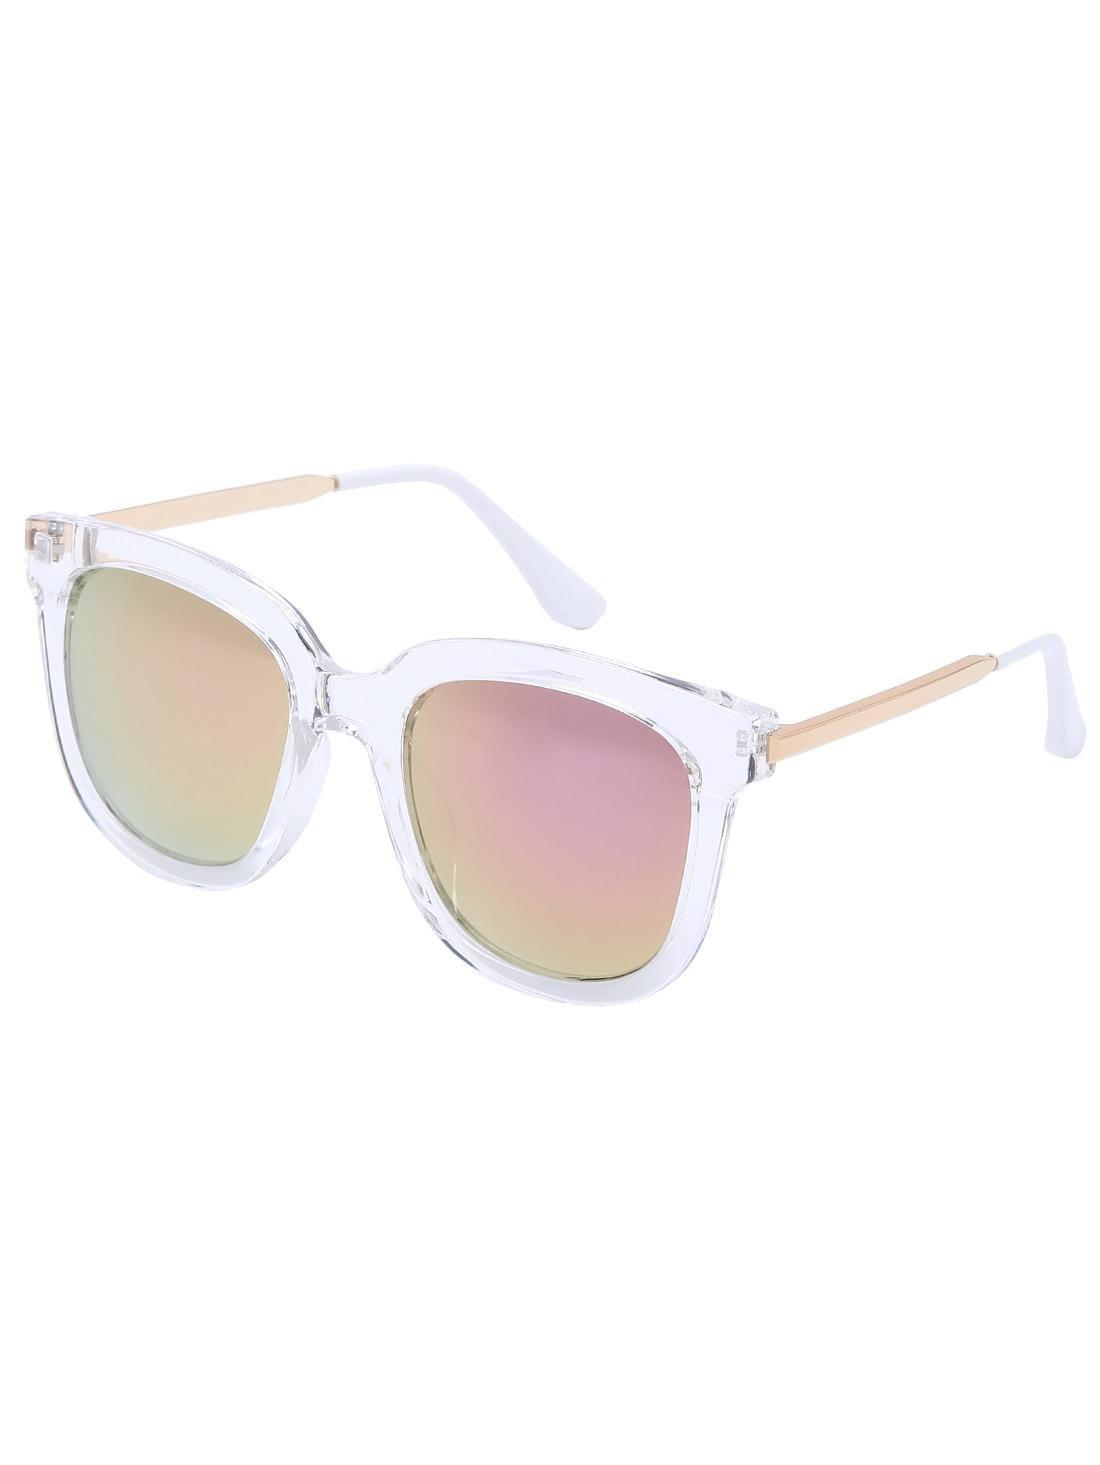 6e6803a264 Retro Pink Lenses Oversized Square Sunglasses